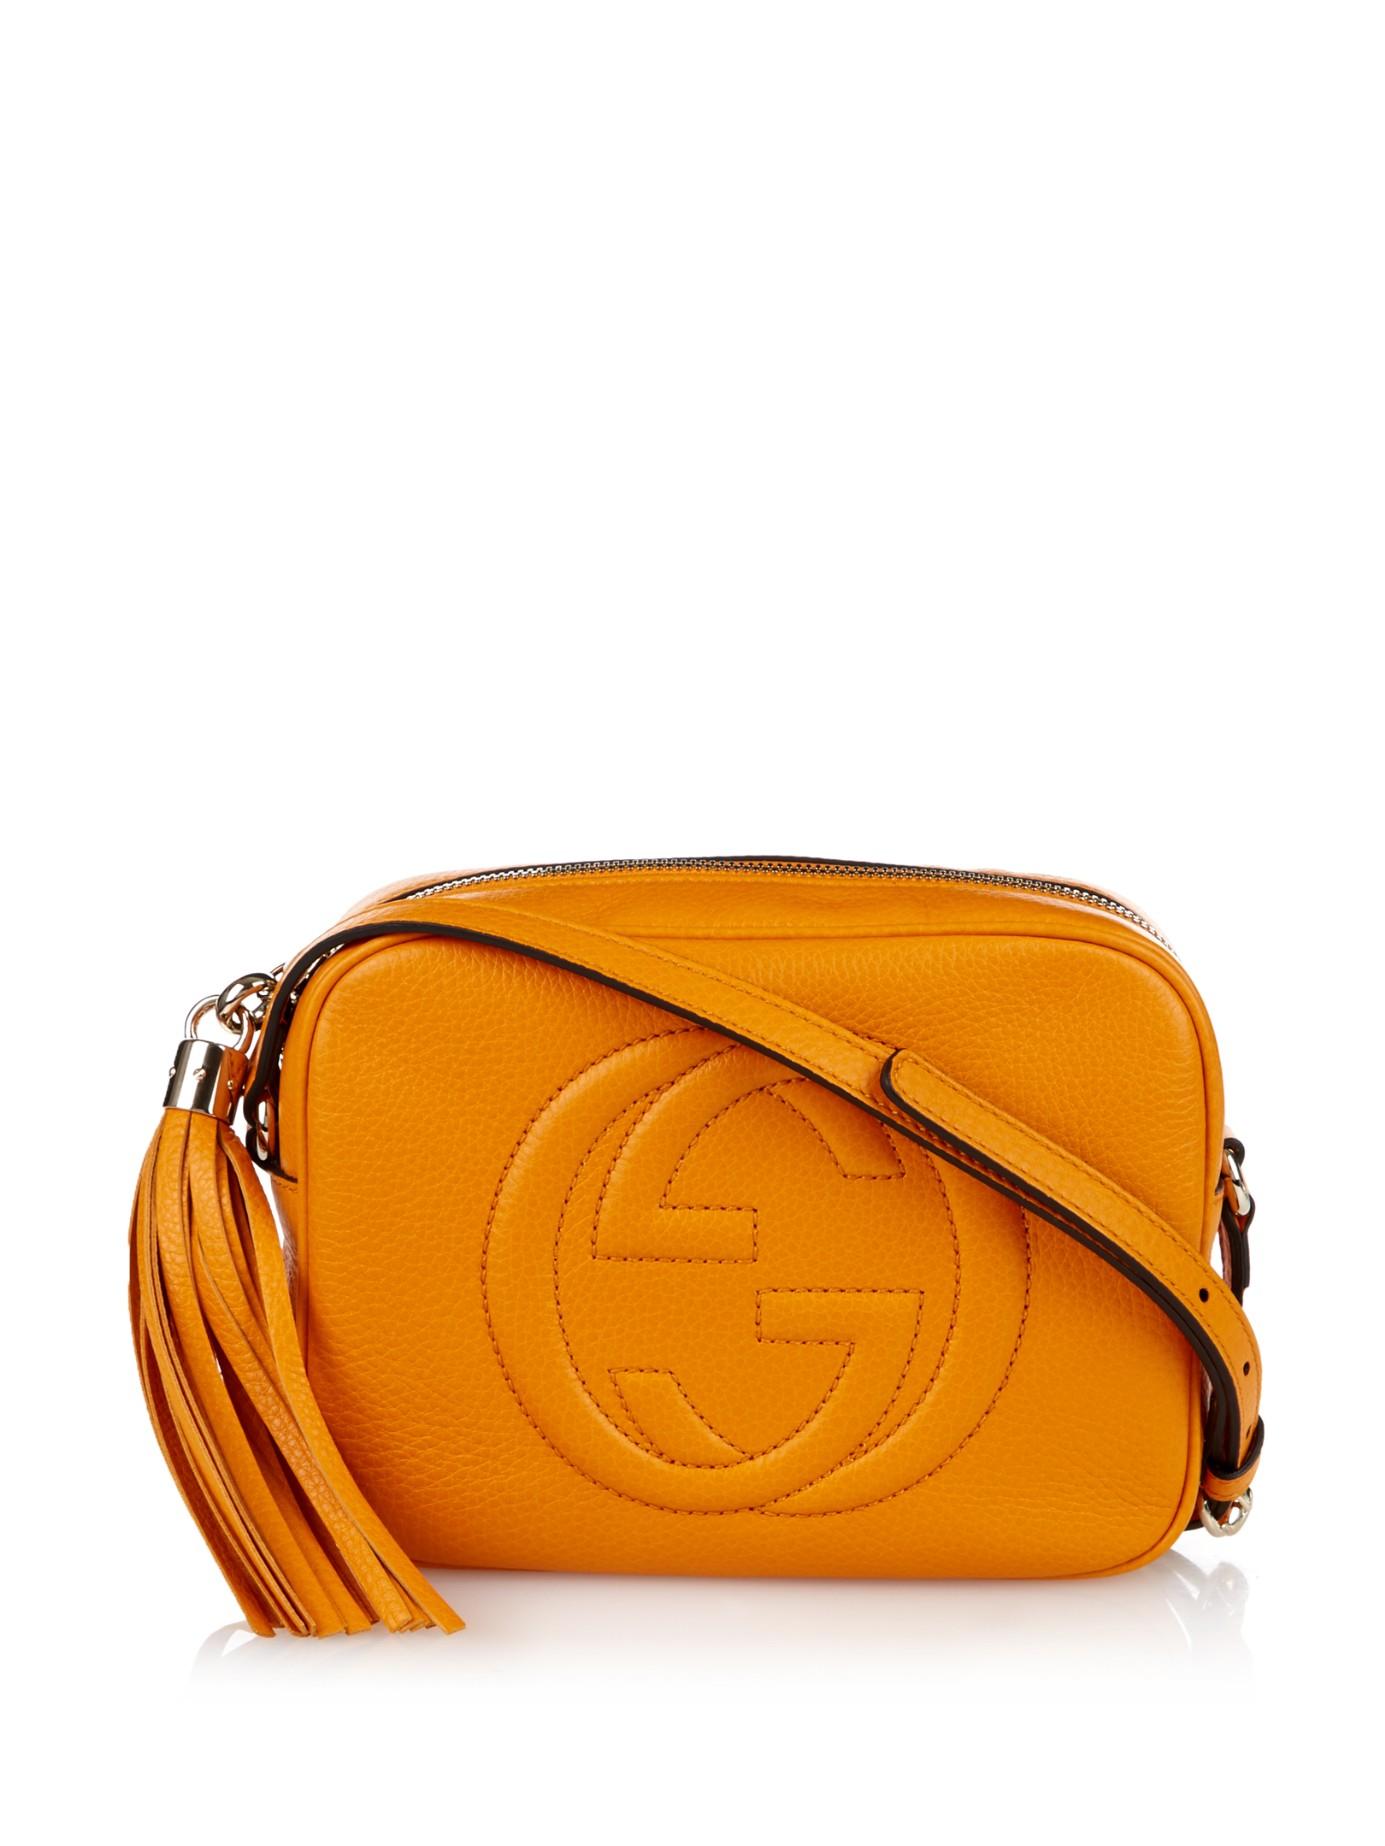 Soho Grained Leather Cross Body Bag